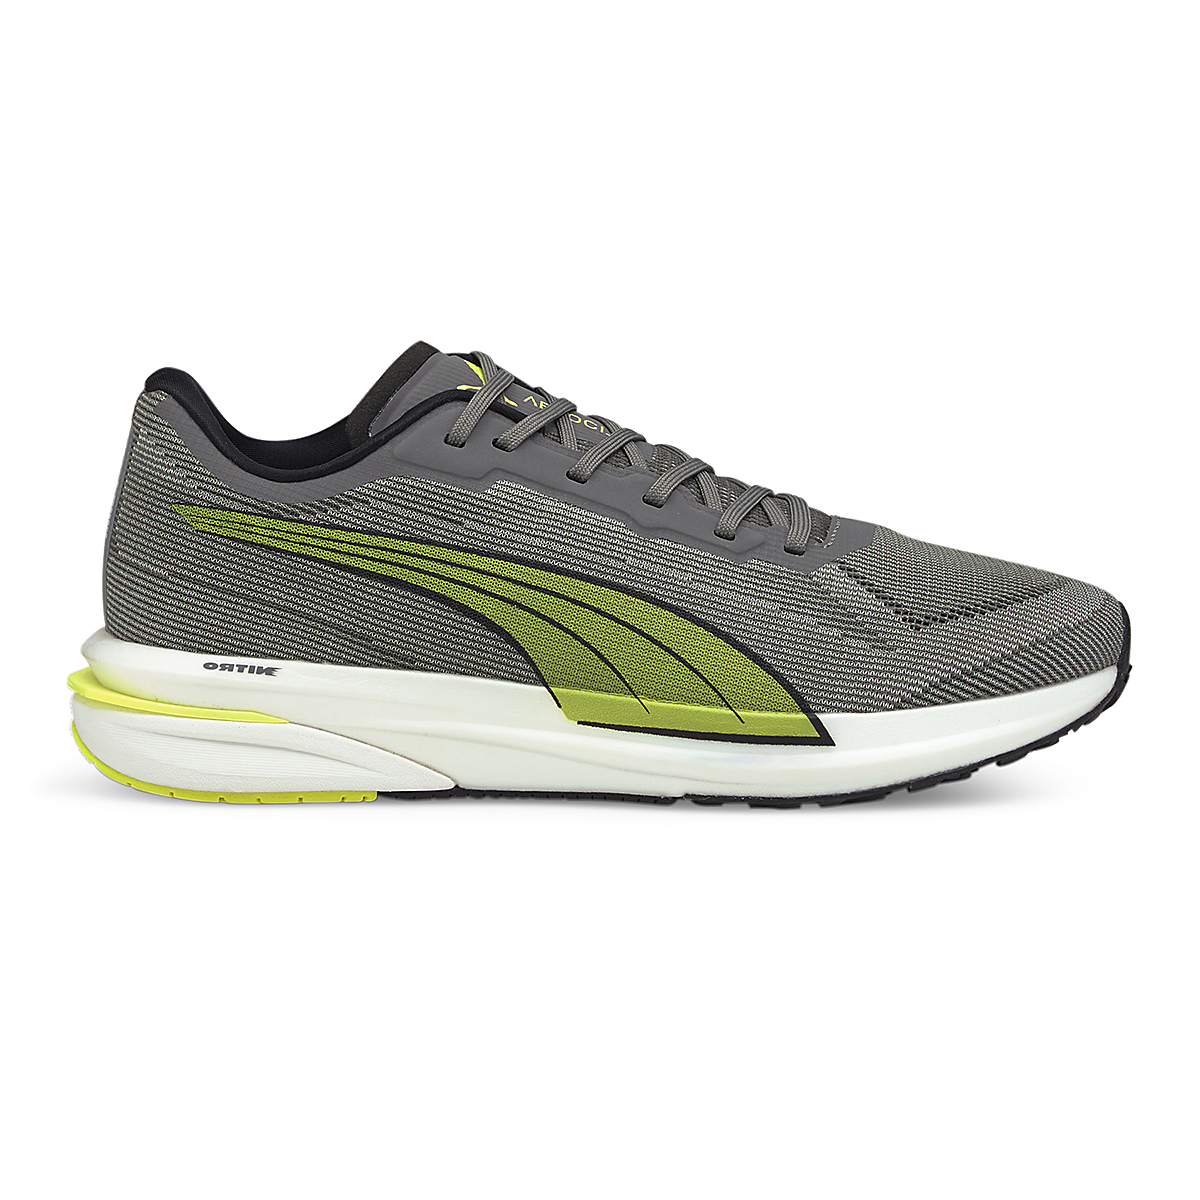 Men's Puma Velocity Nitro Running Shoe - Color: Castlerock-Yellow Alert-Puma Black - Size: 7 - Width: Regular, Castlerock-Yellow Alert-Puma Black, large, image 1